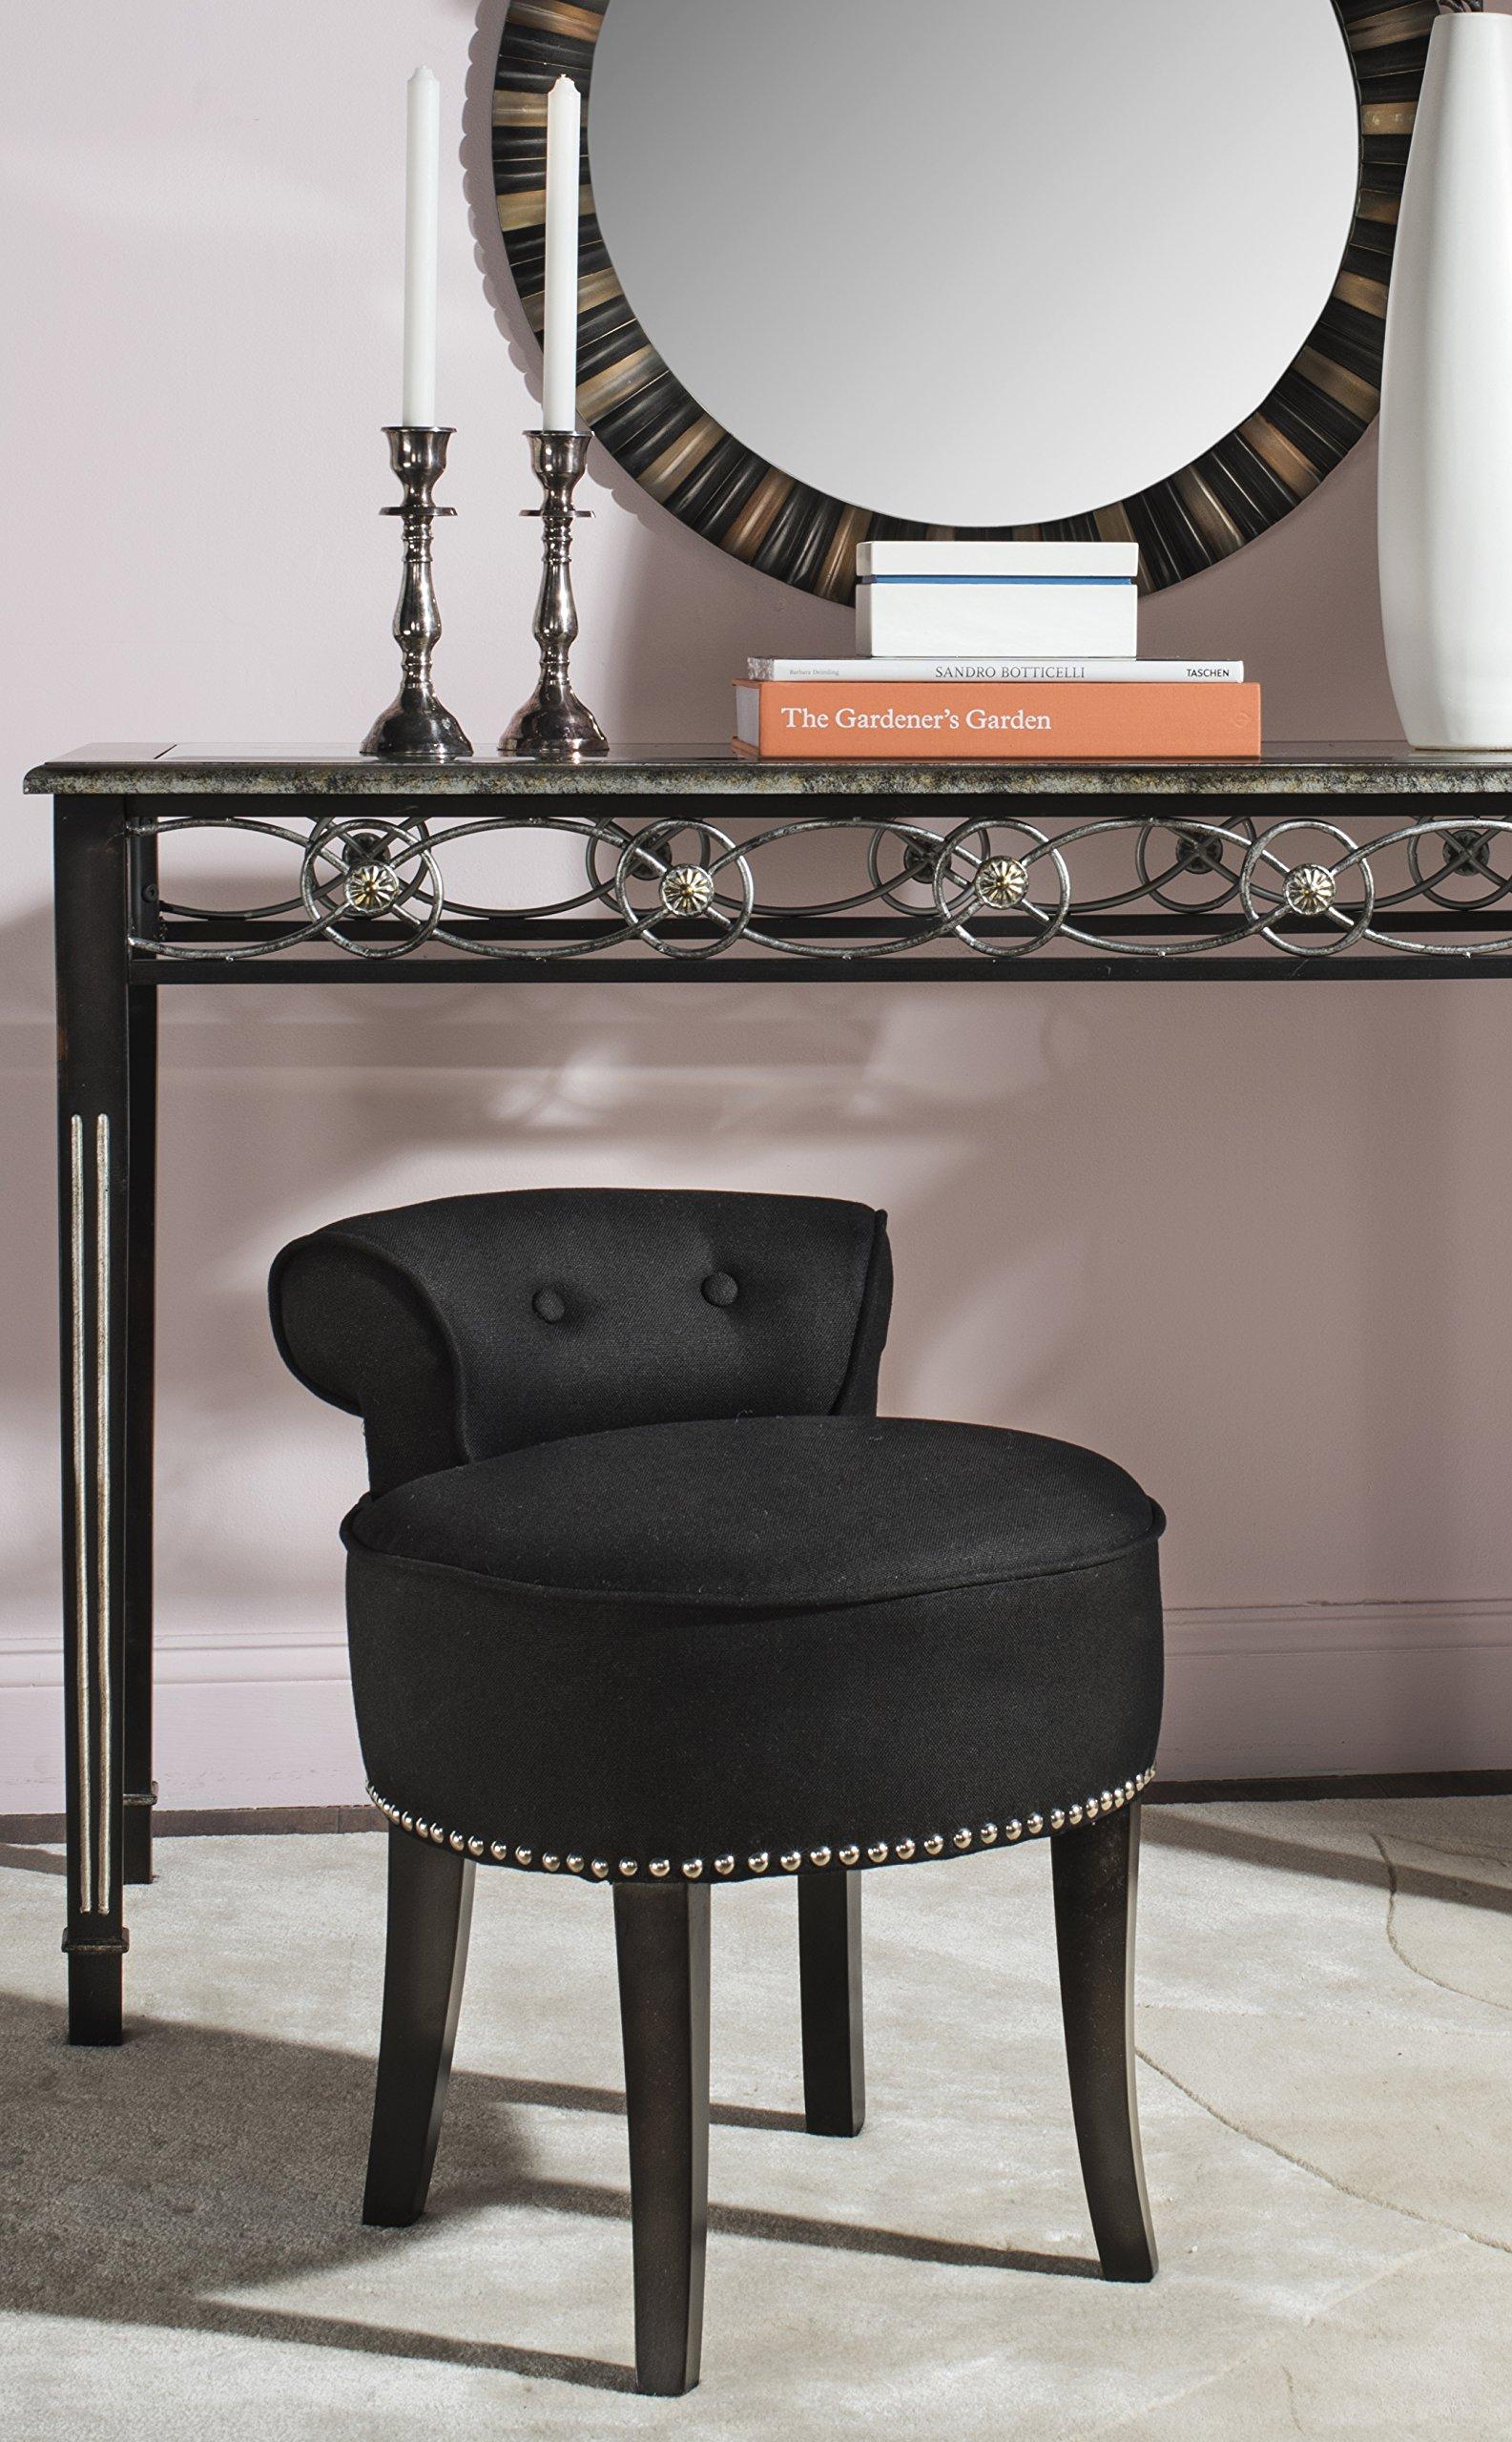 Enjoyable Details About Safavieh Mercer Collection Georgia Vanity Stool Black Machost Co Dining Chair Design Ideas Machostcouk